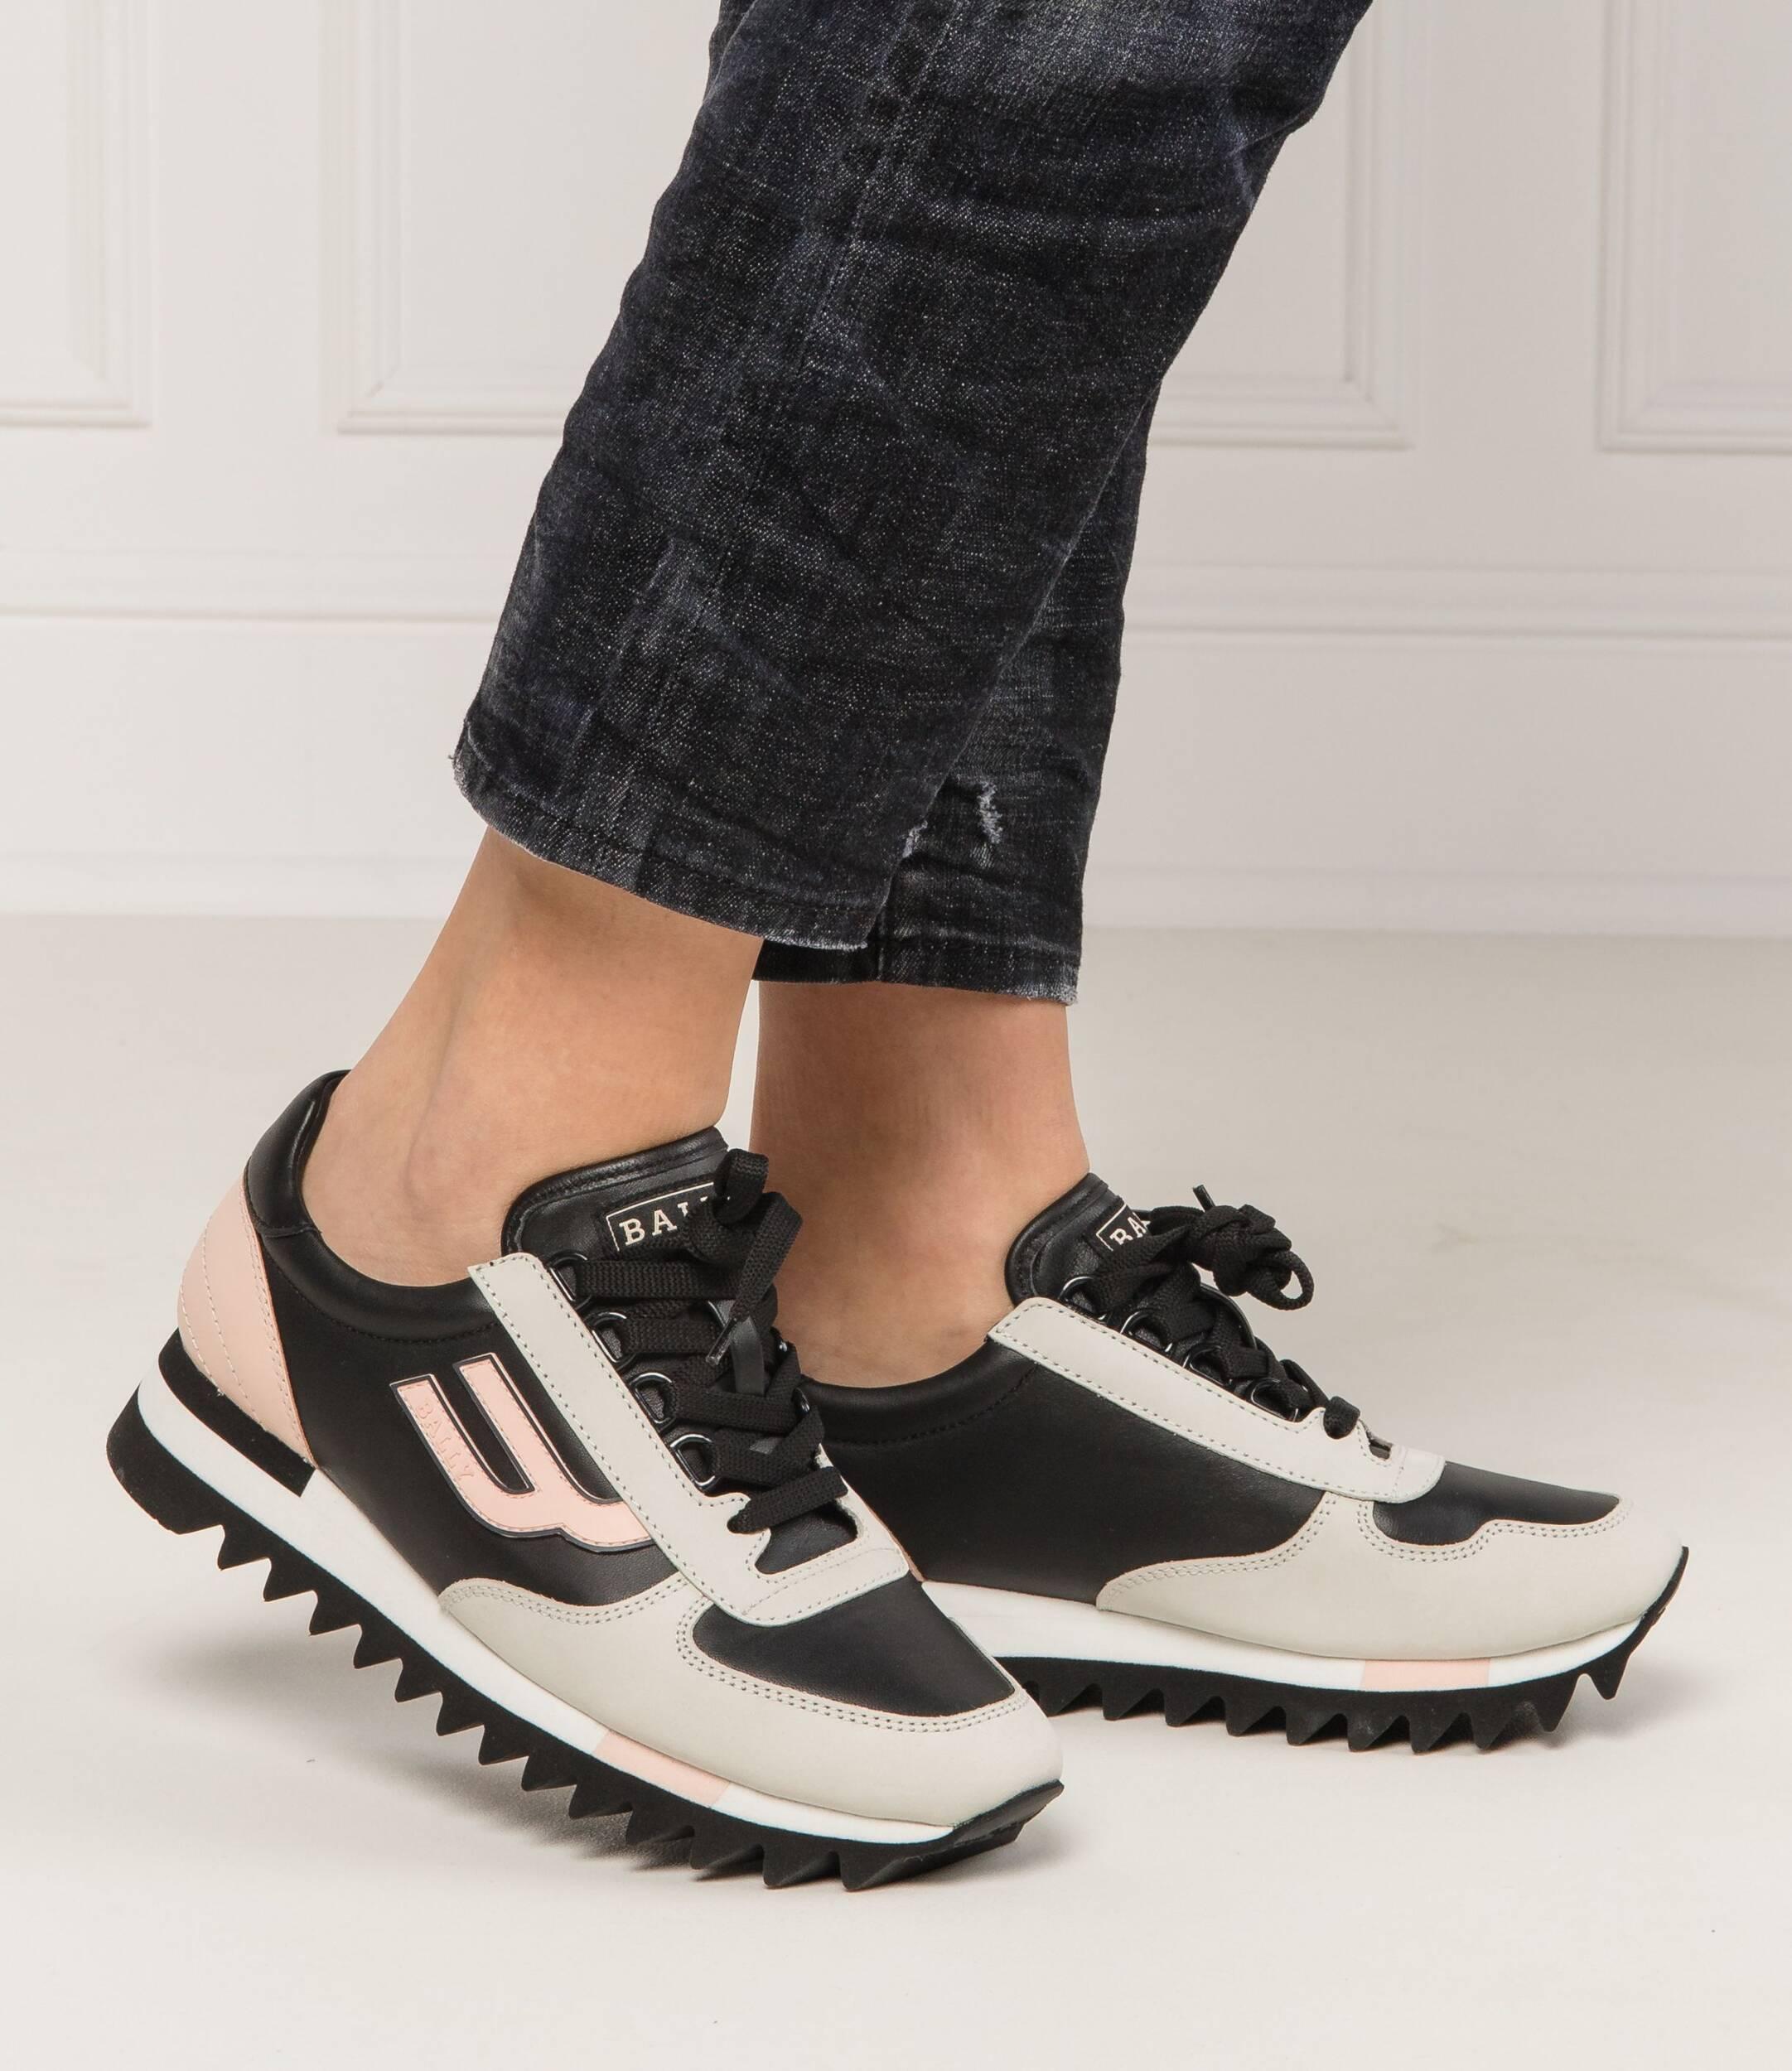 Leather sneakers GAVINIA Bally | Gray